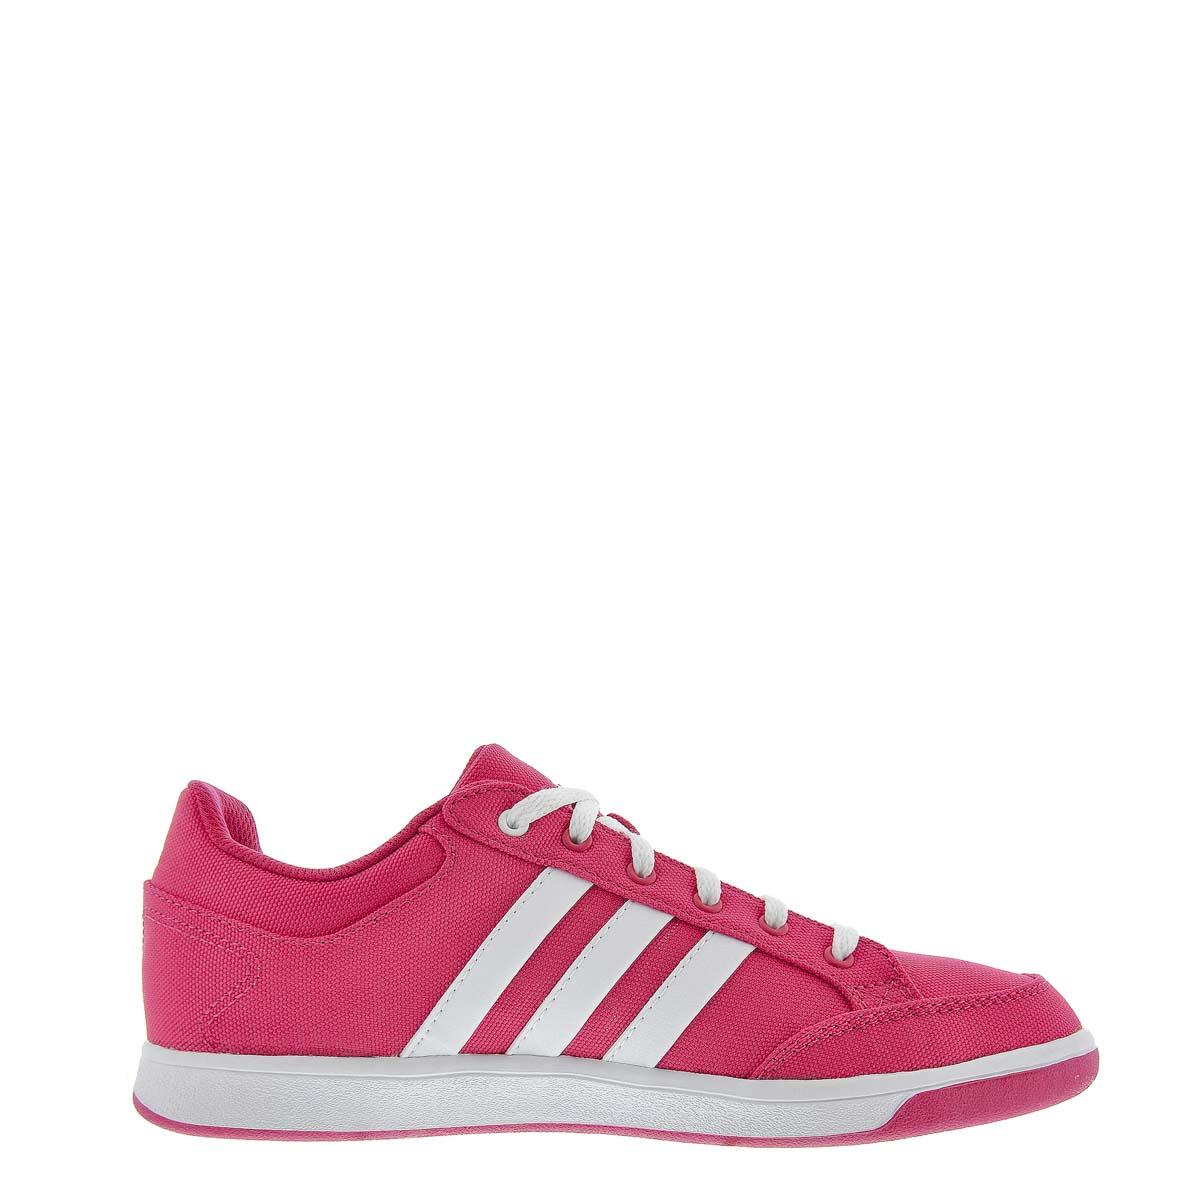 Adidas ORACLE_VI_STAR